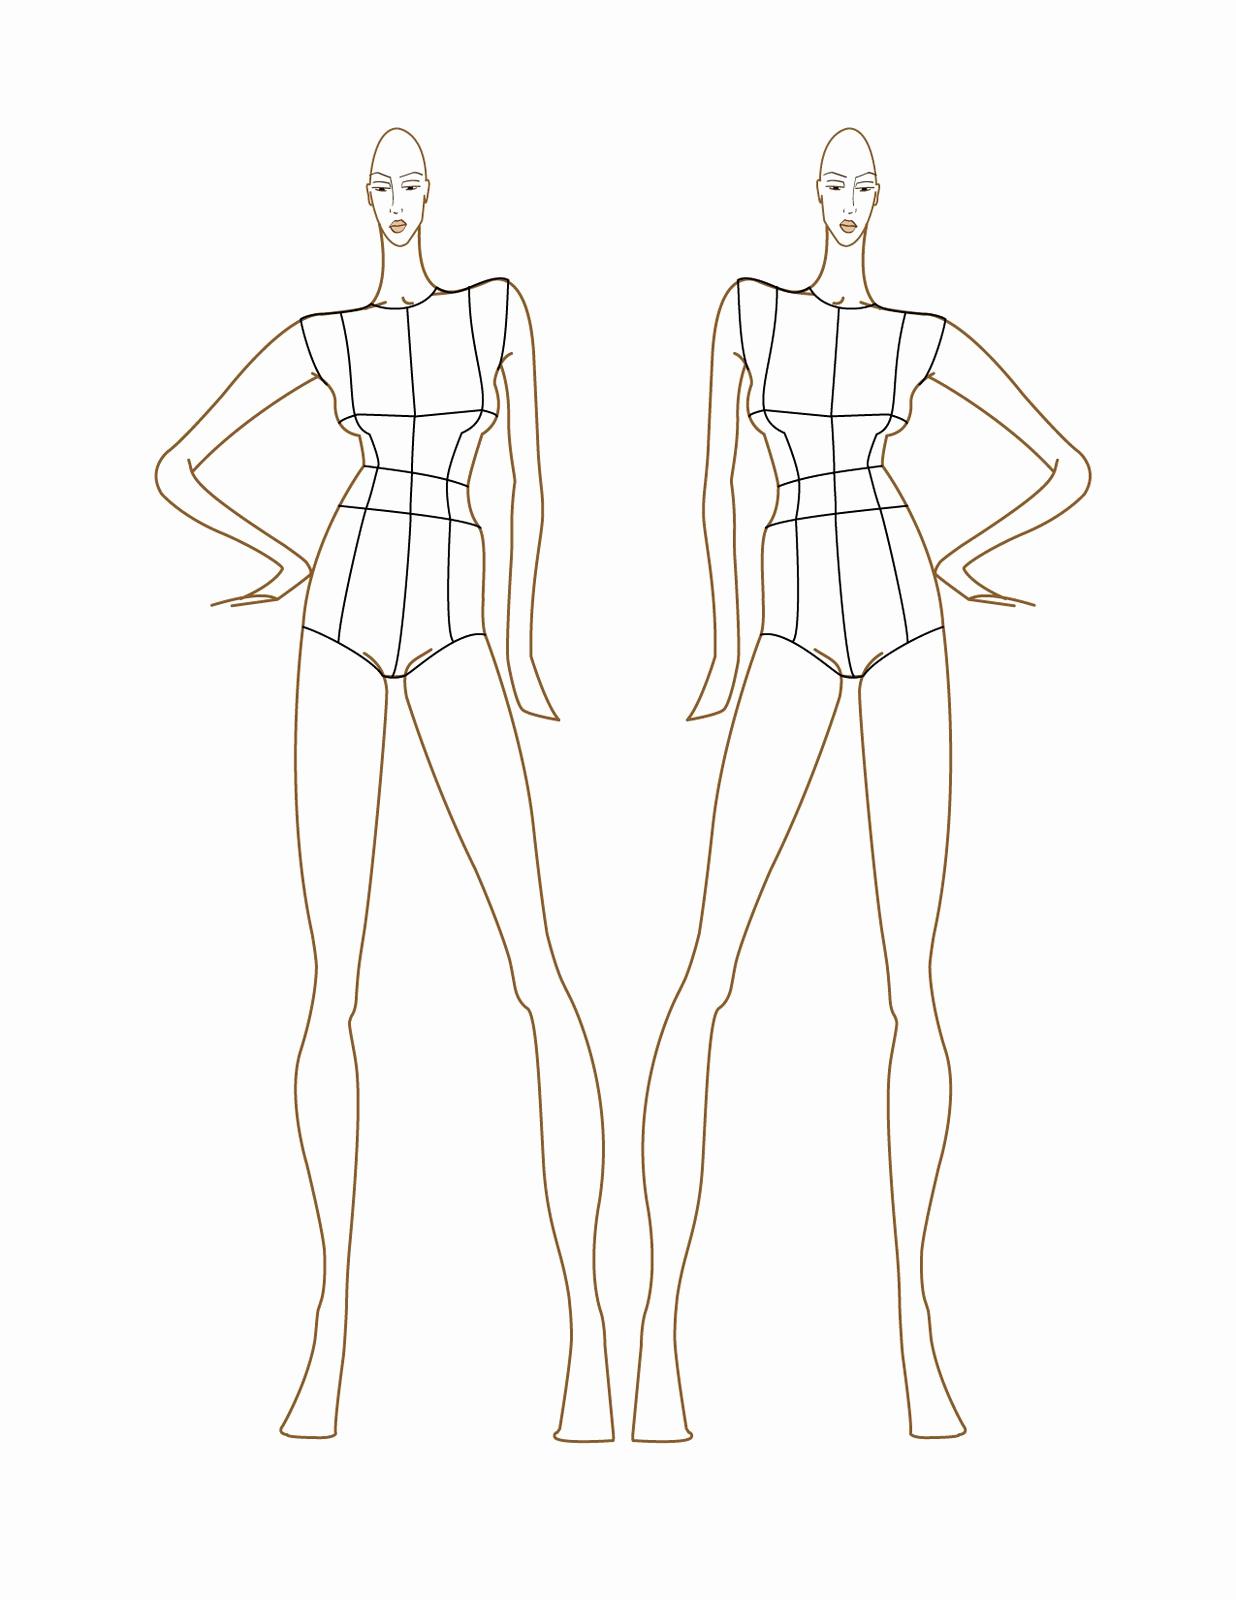 Body Template for Fashion Design Elegant 13 Clothing Design Templates for Men Fashion